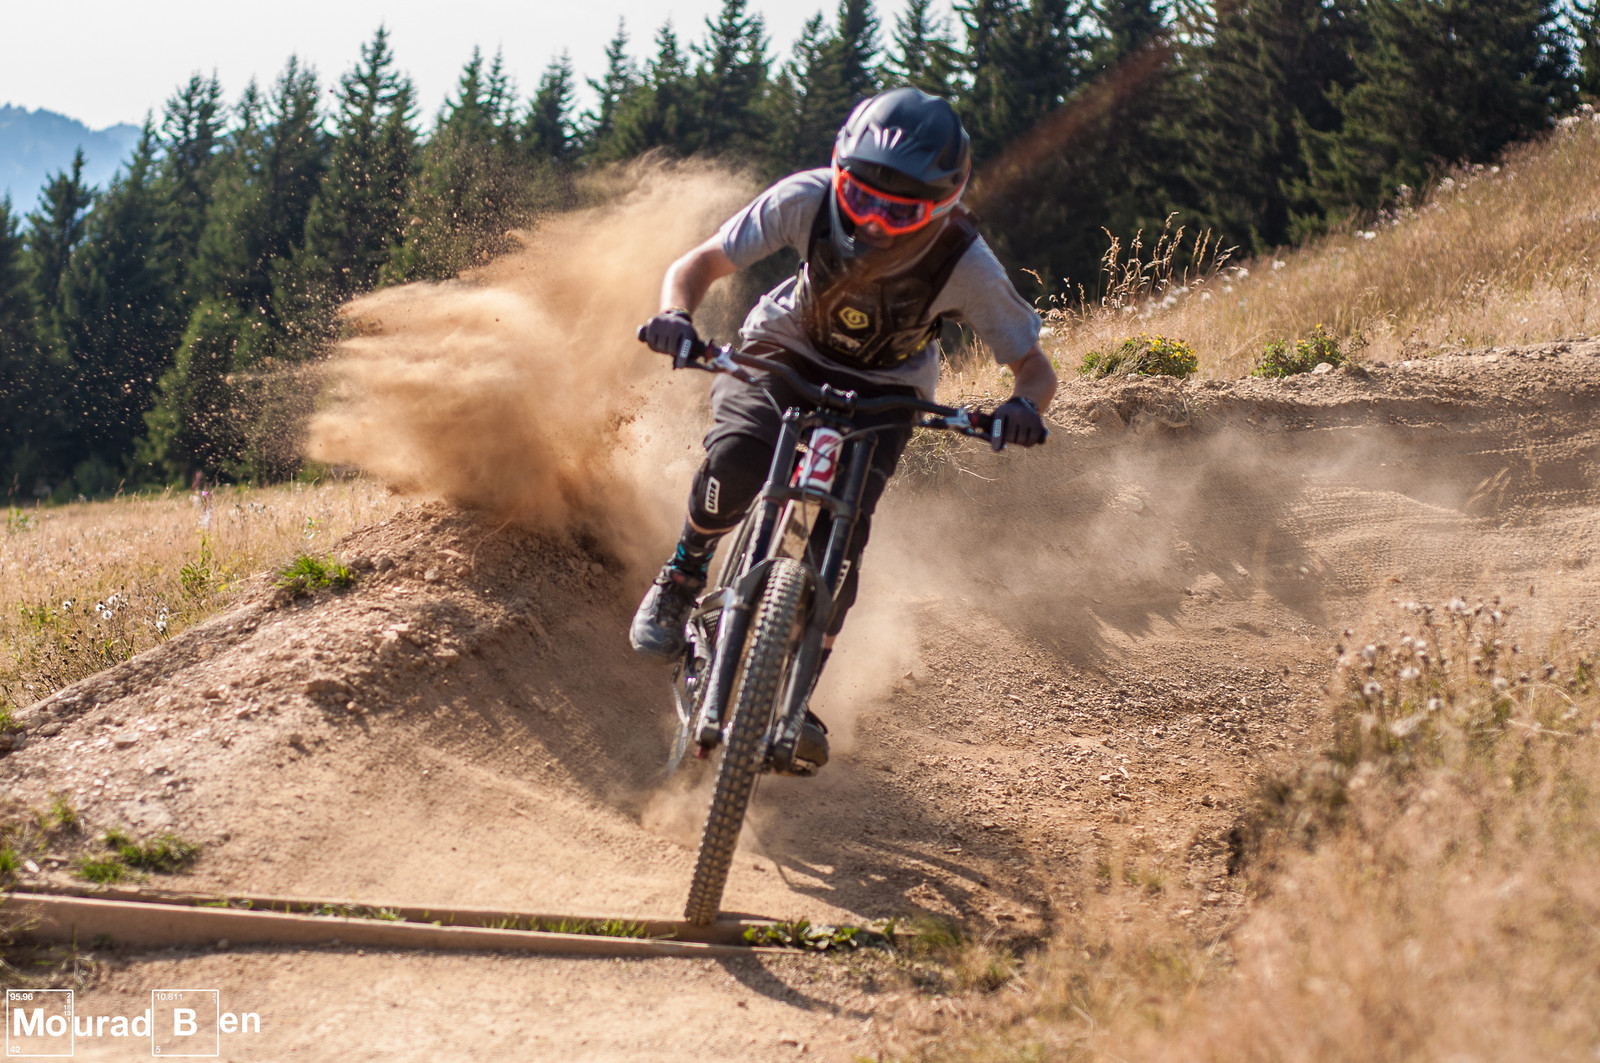 Strang cloud - Romuald_Manach - Mountain Biking Pictures - Vital MTB